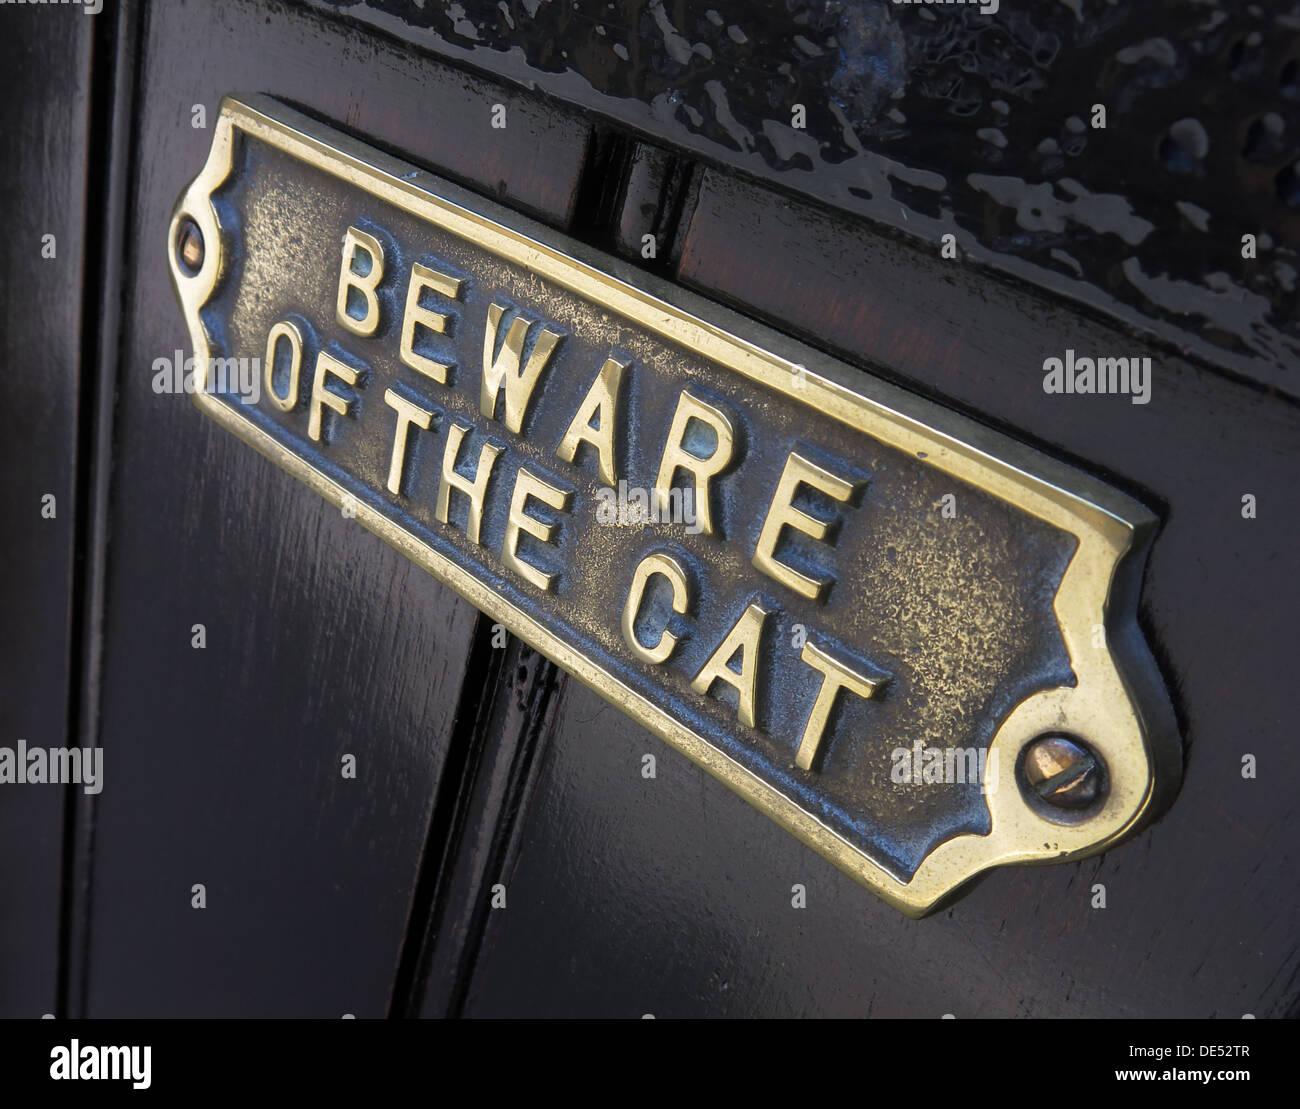 Beware of the cat sign on a door - Stock Image